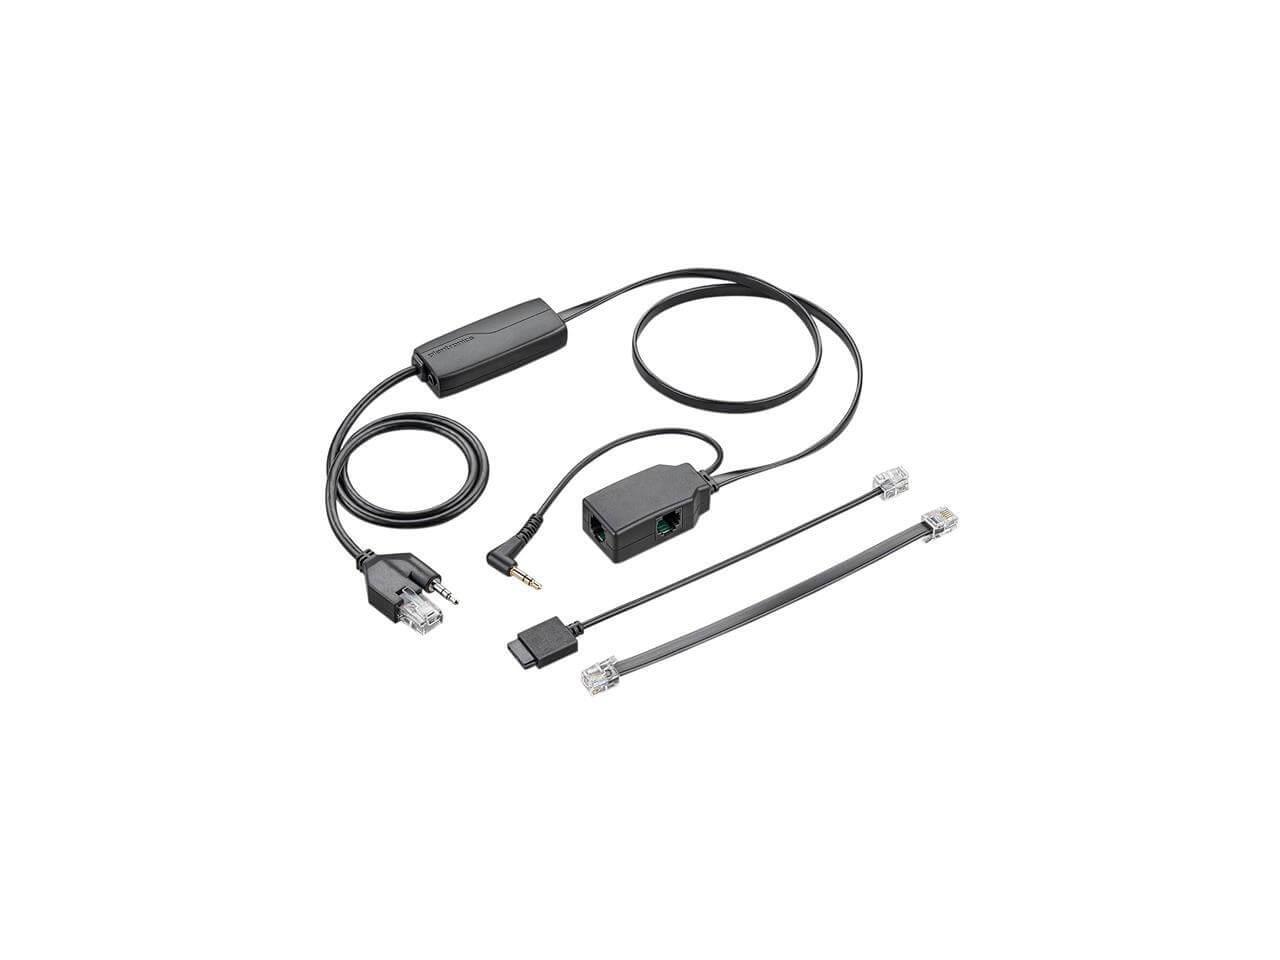 Plantronics APA-24 EHS Cable (Alacatel)